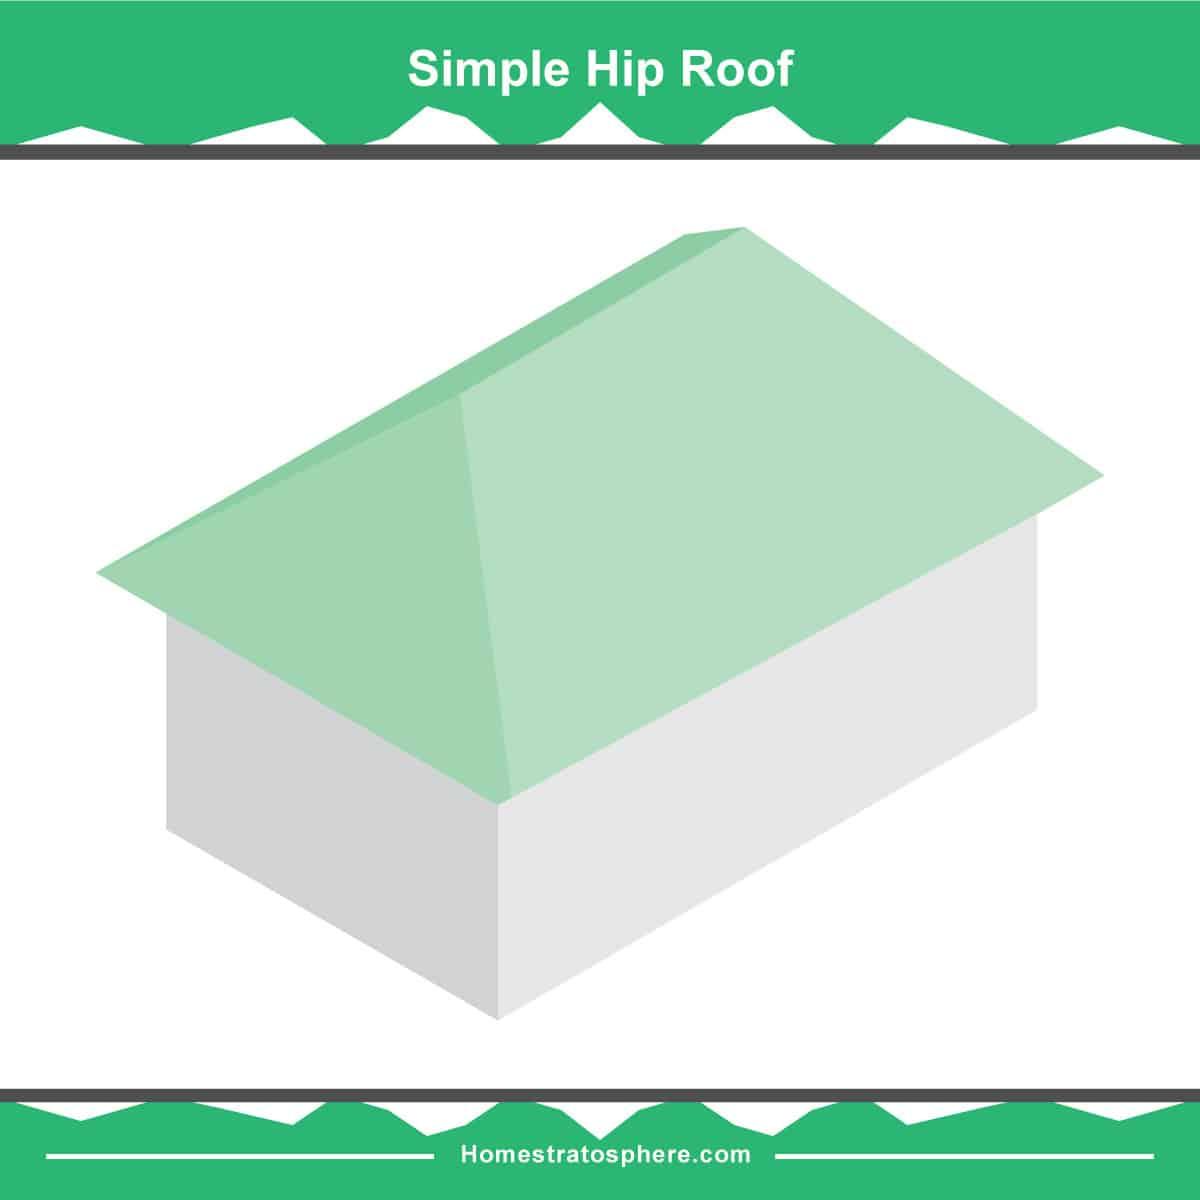 Simple hip roof diagram